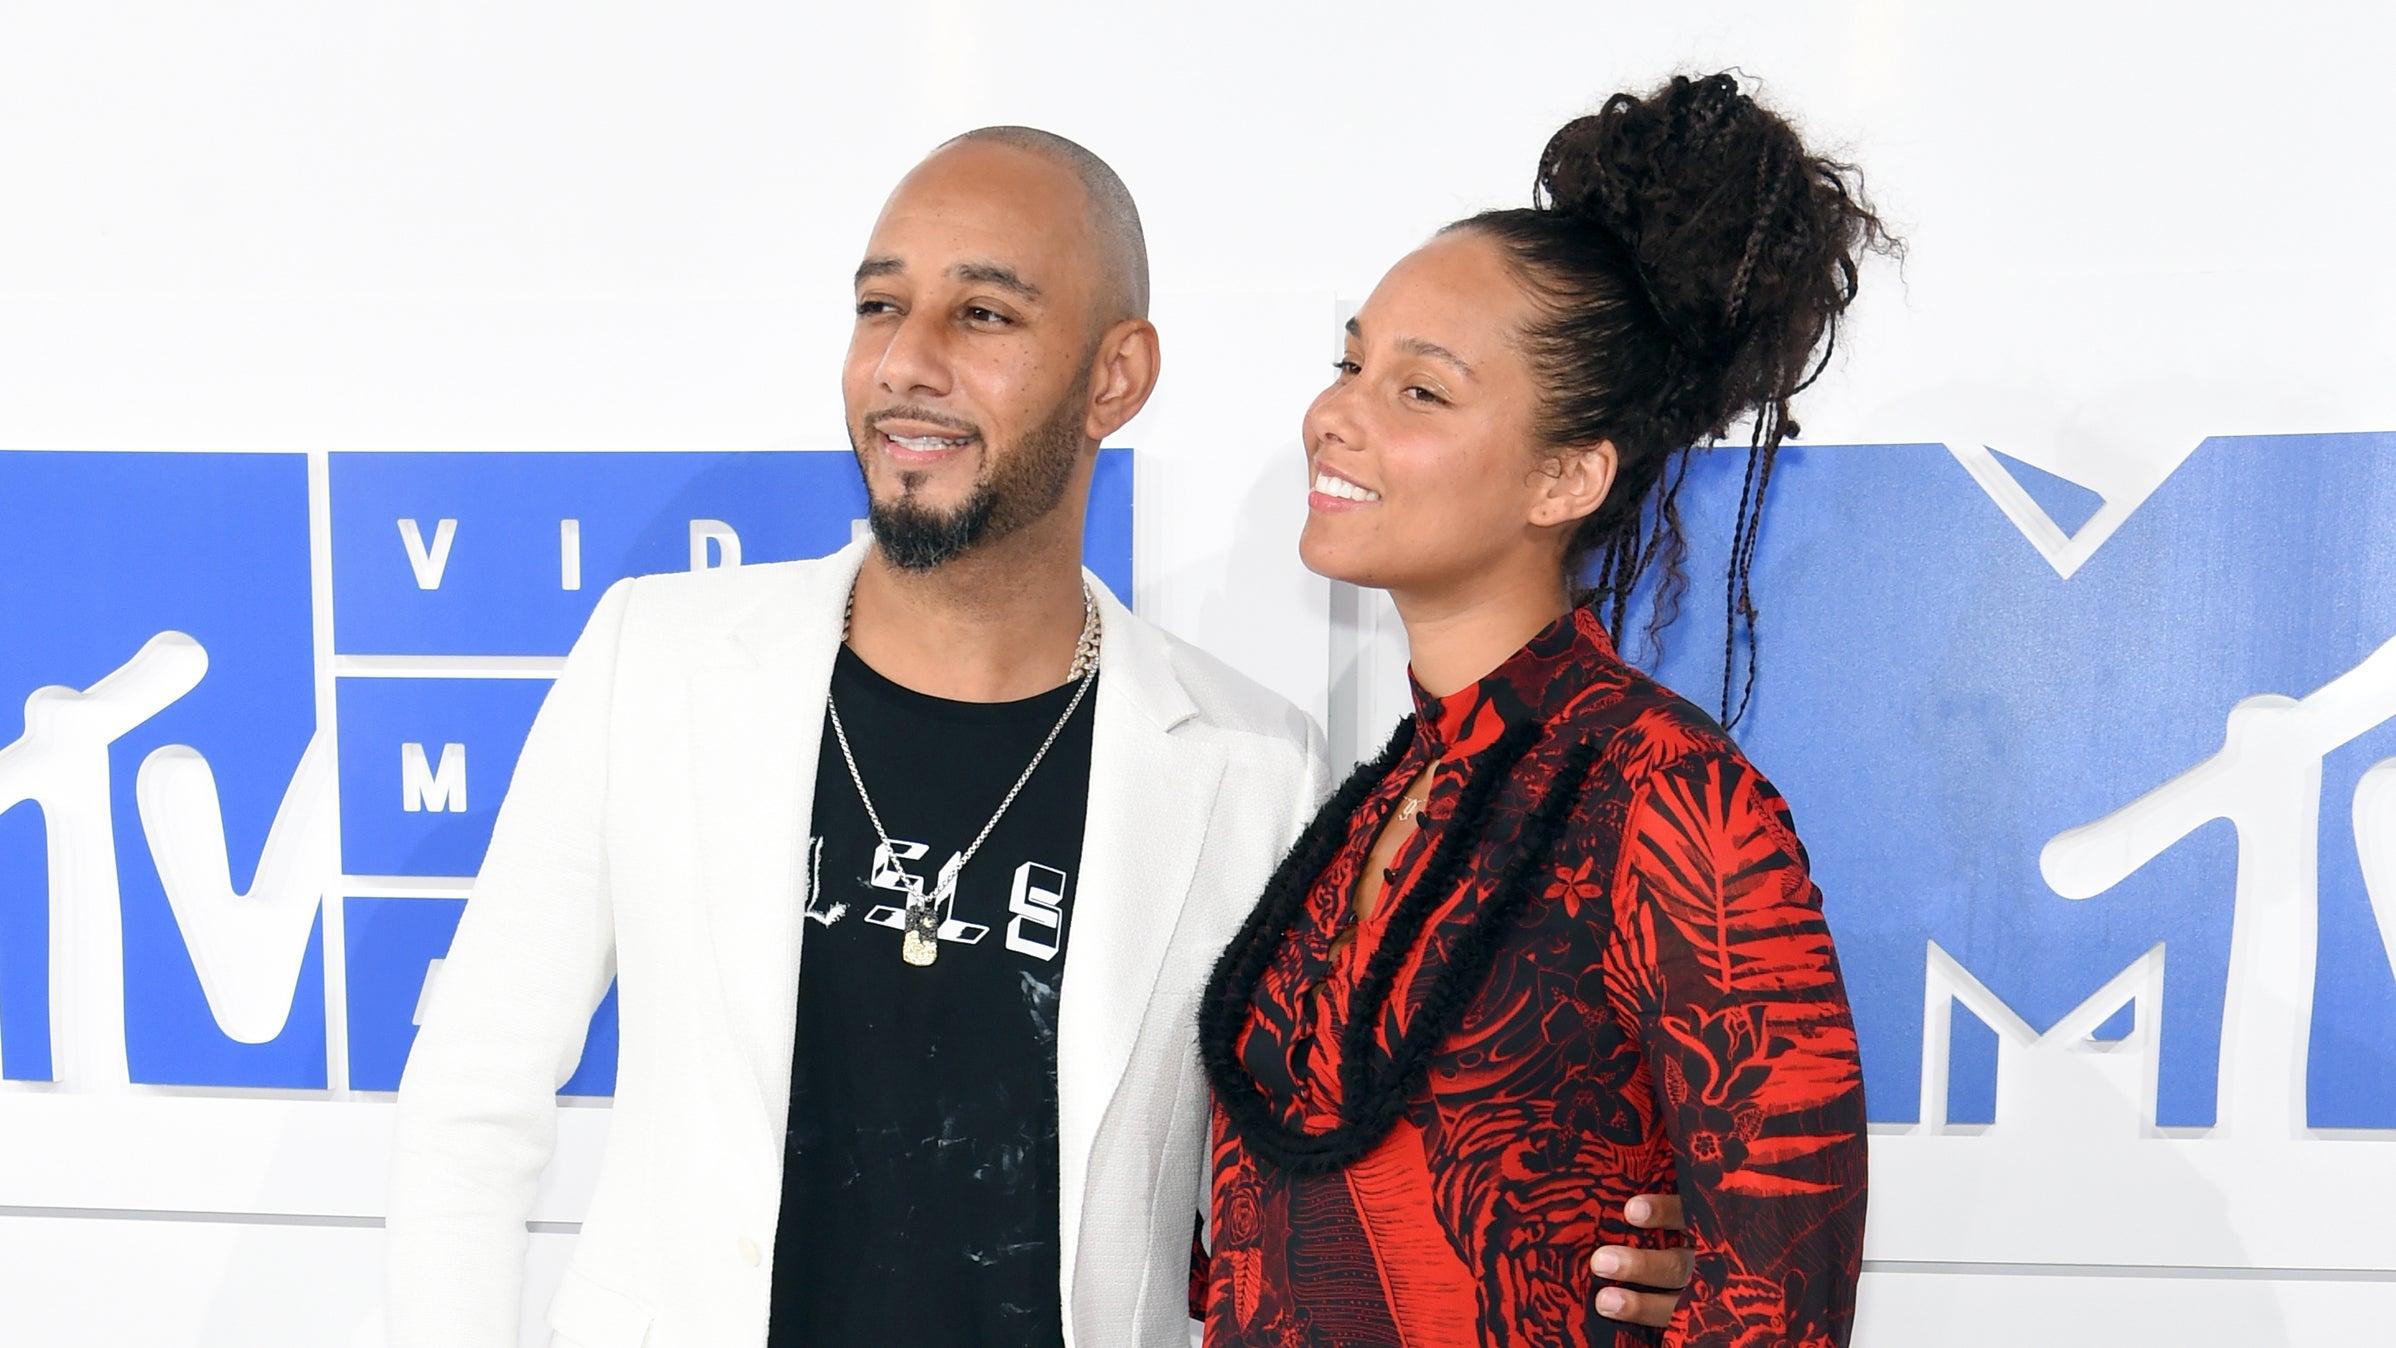 Alicia Keys And Swizz Beatz Share Heartfelt Messages To Celebrate 7th Wedding Anniversary Entertainment Tonight